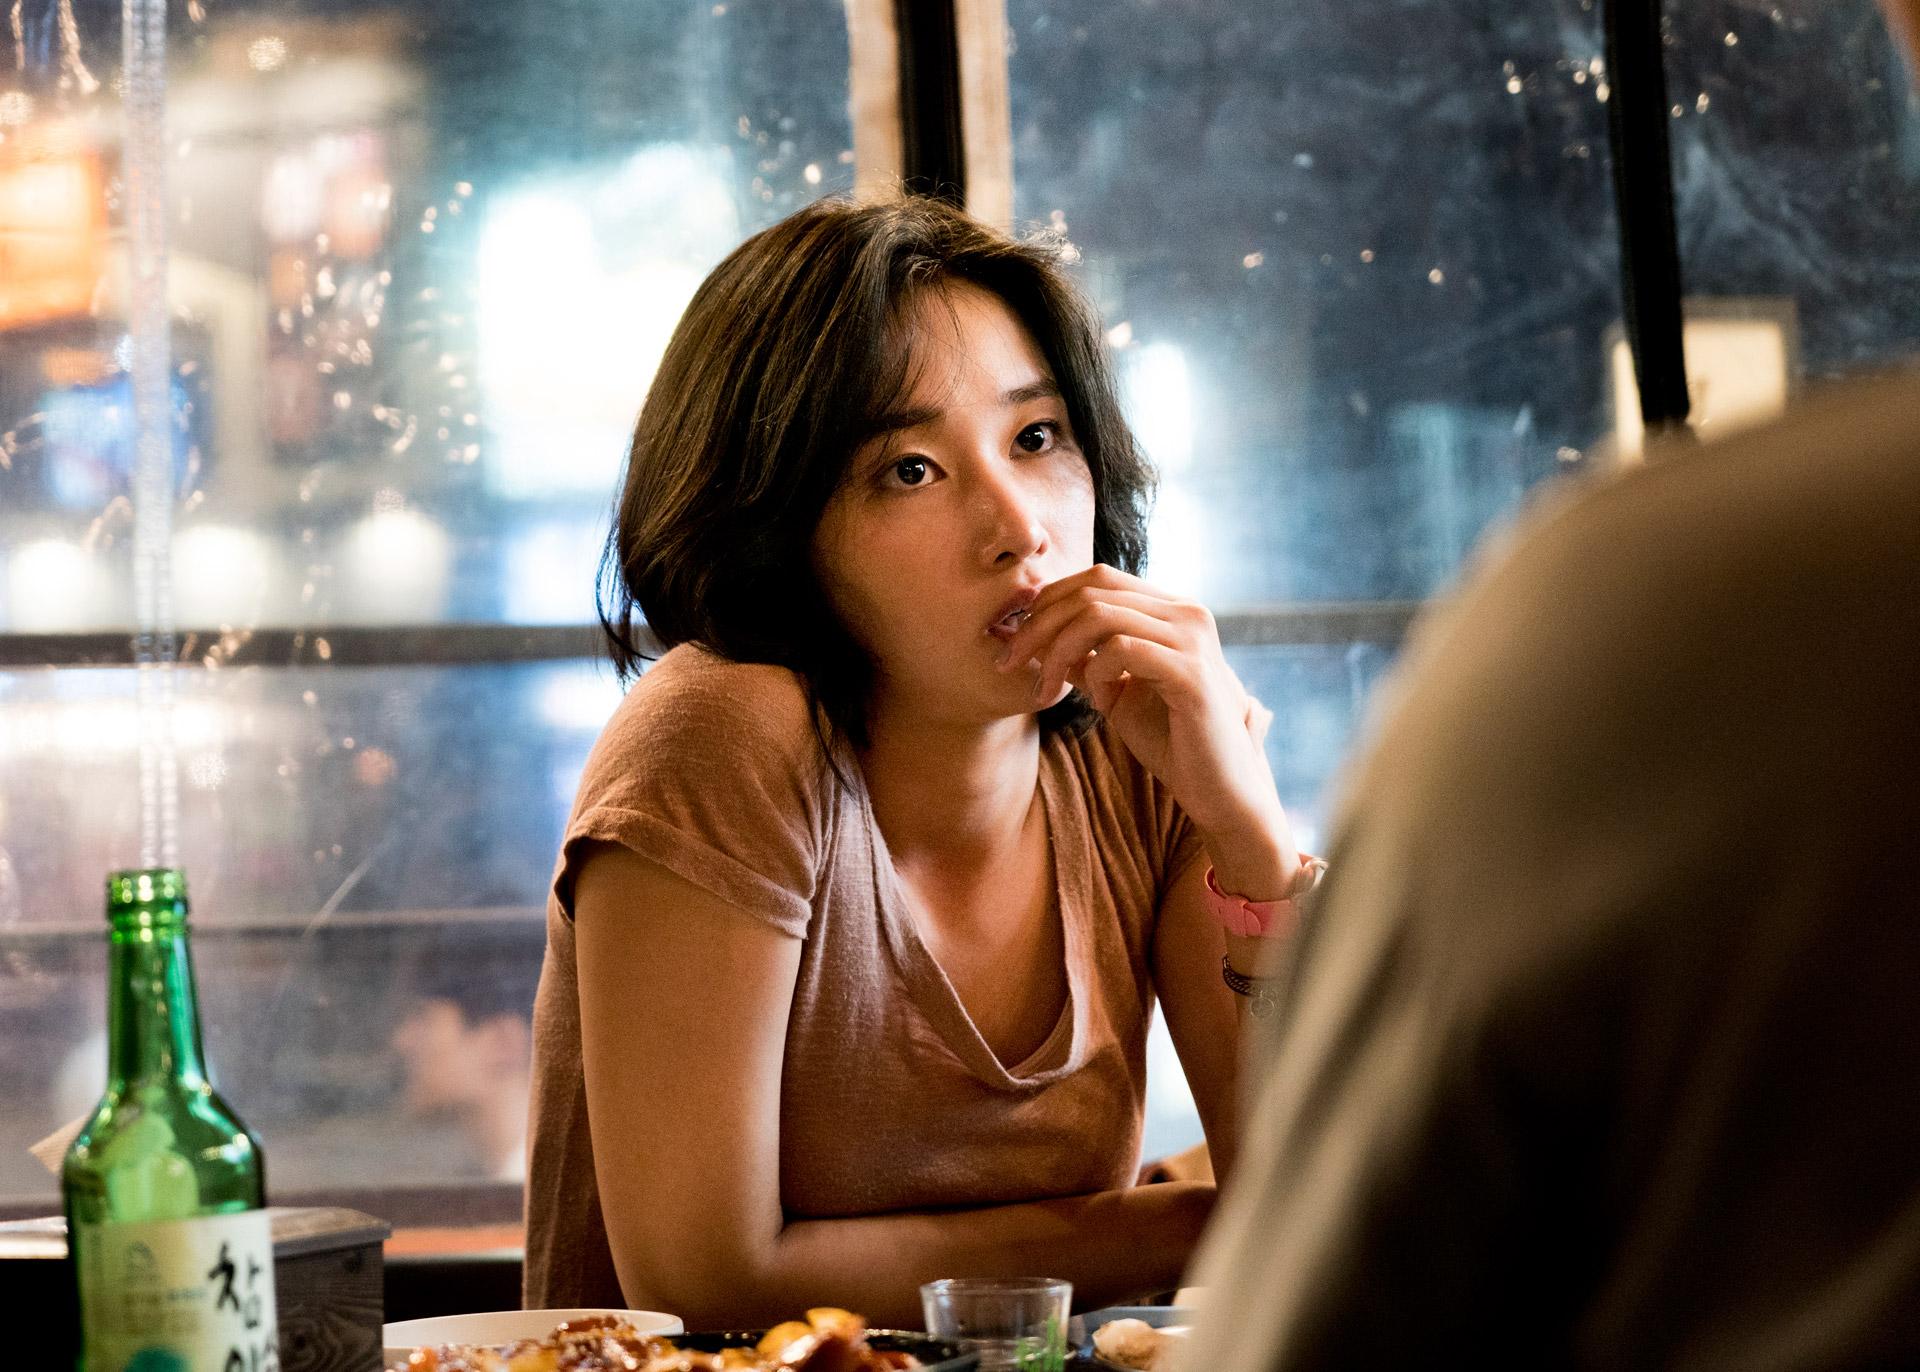 Jeon Jong Seo Burning